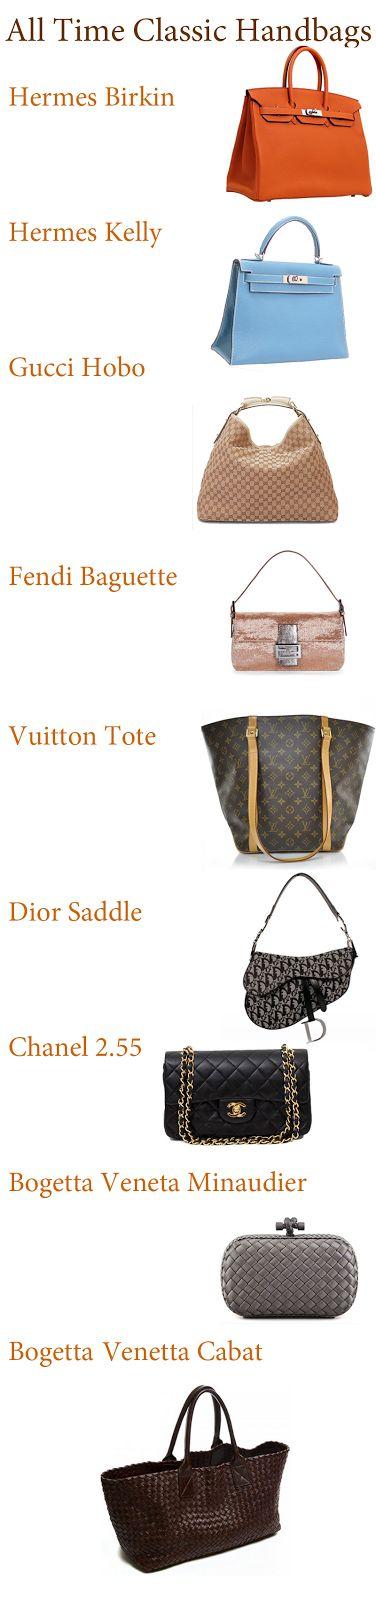 All Time Classic Handbags:  #handbags #designer #classic #style